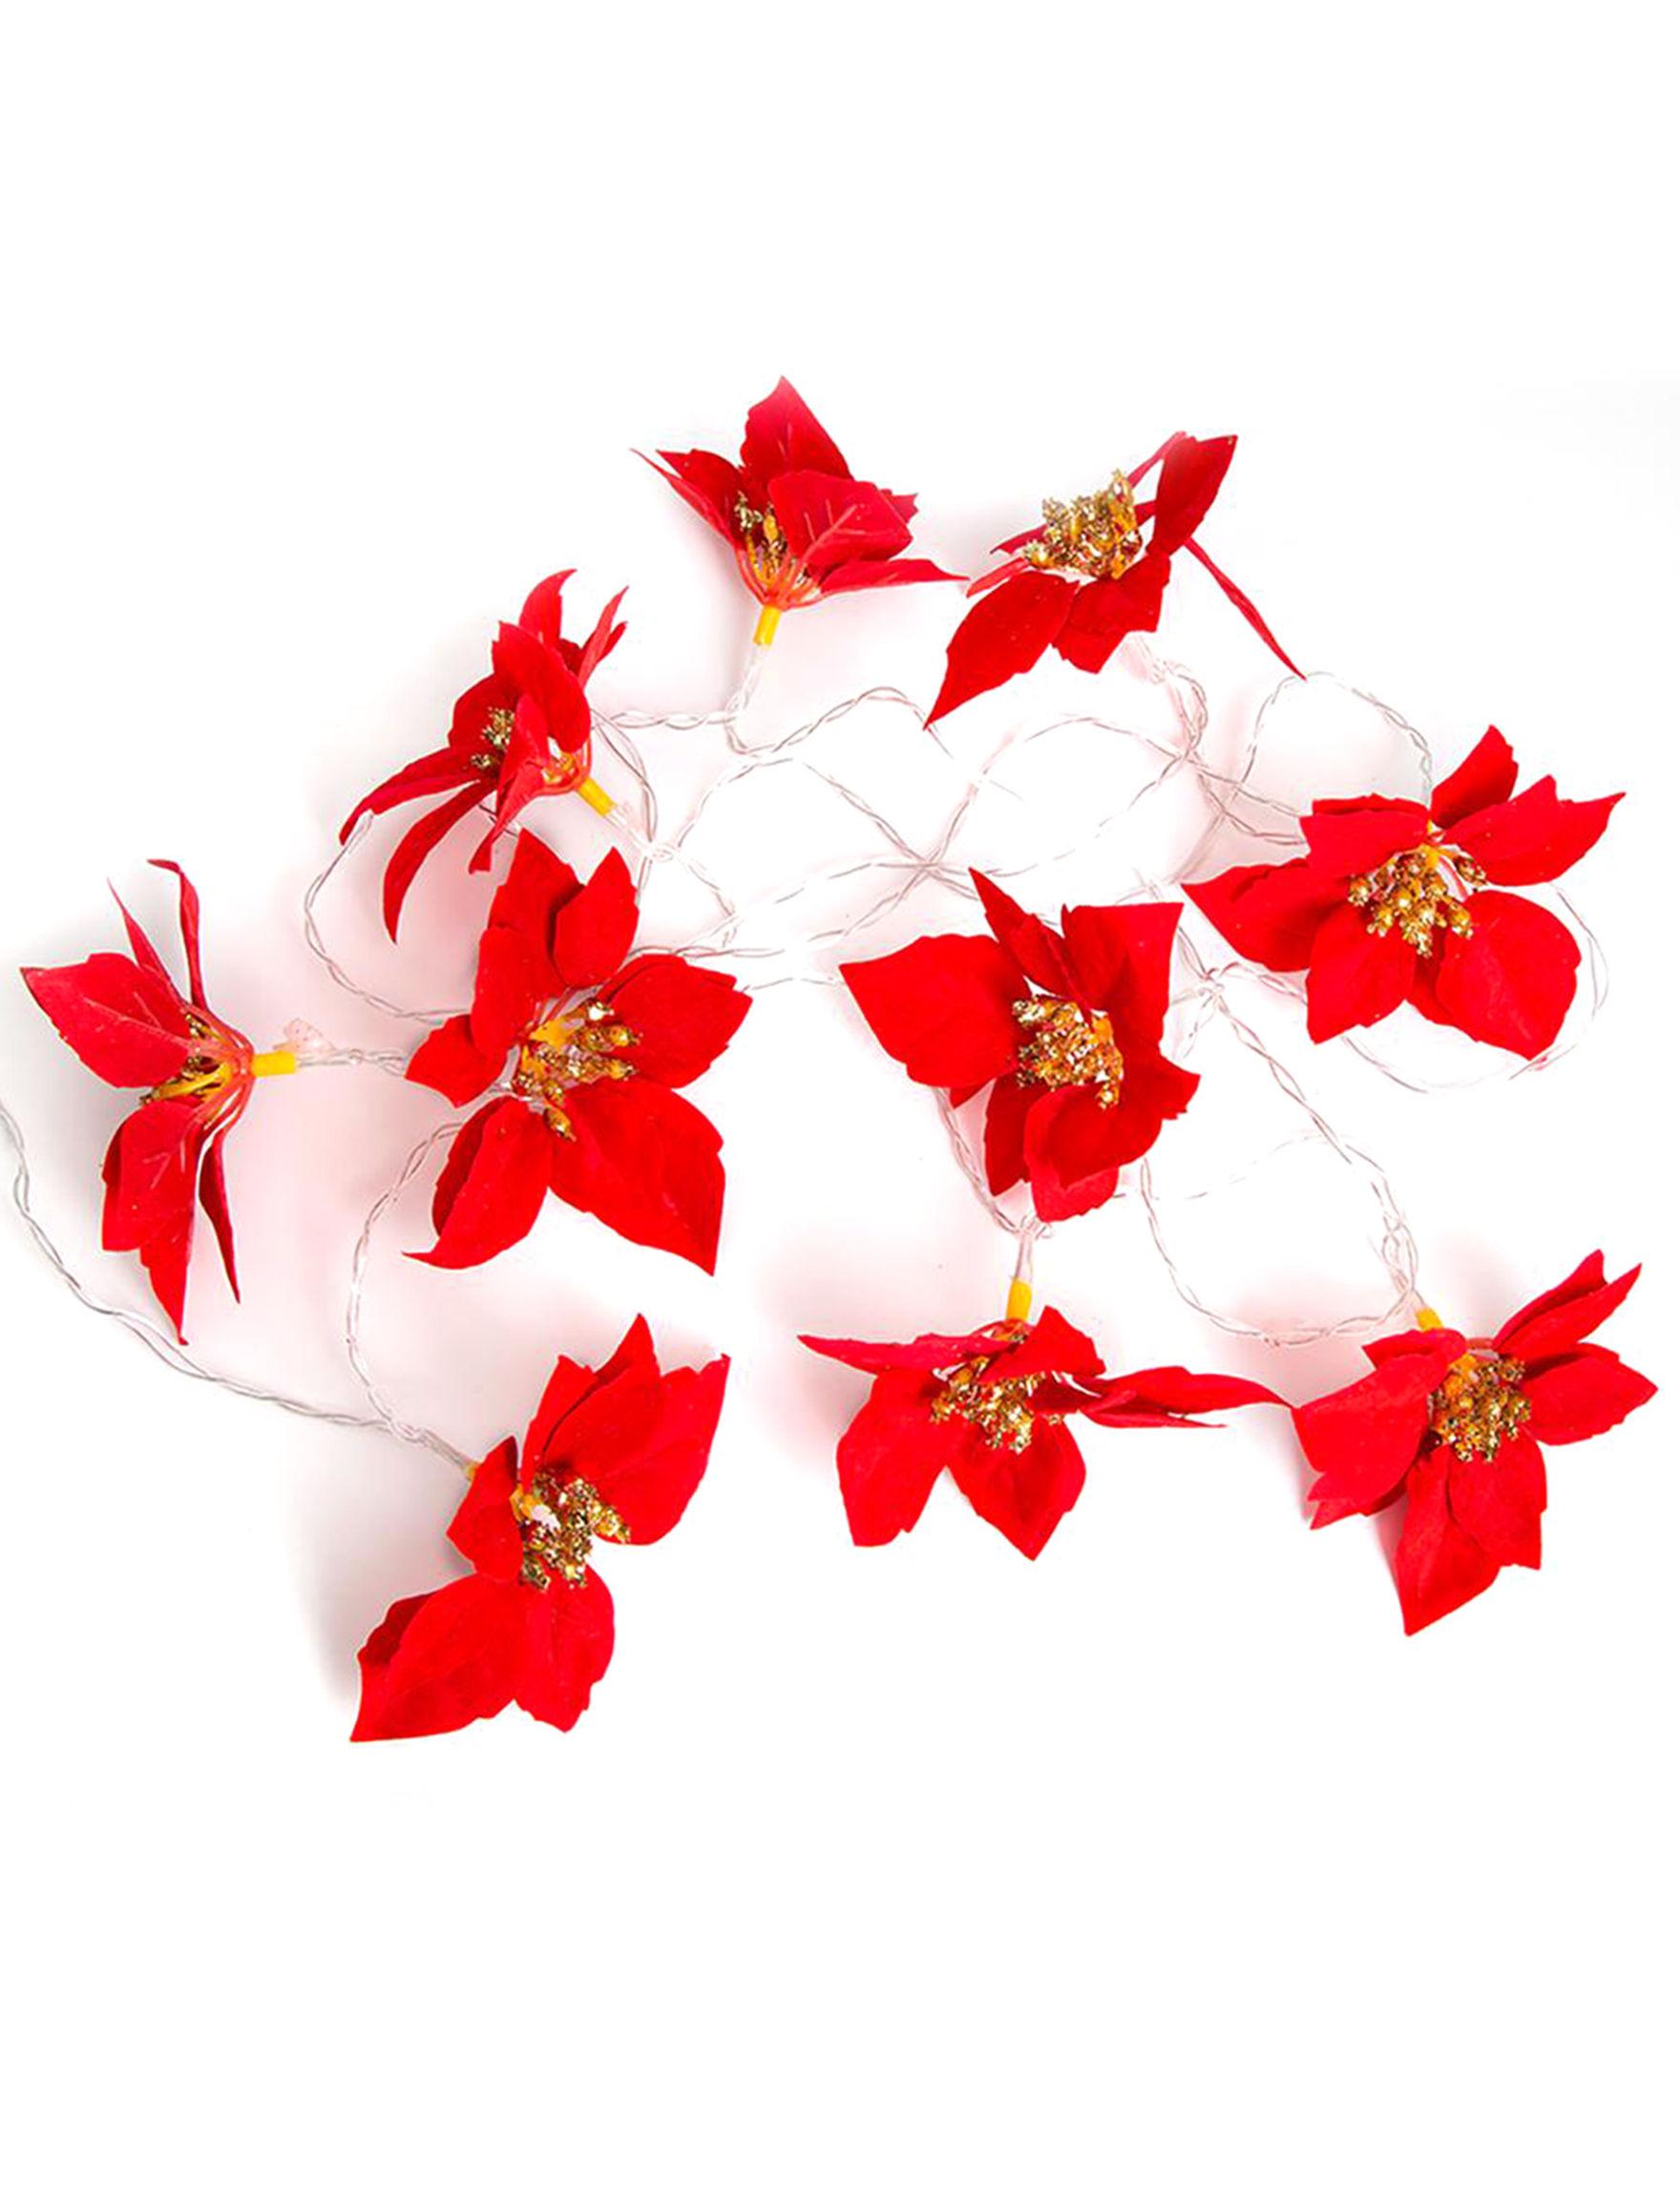 Apothecary Red Christmas Lights Holiday Decor